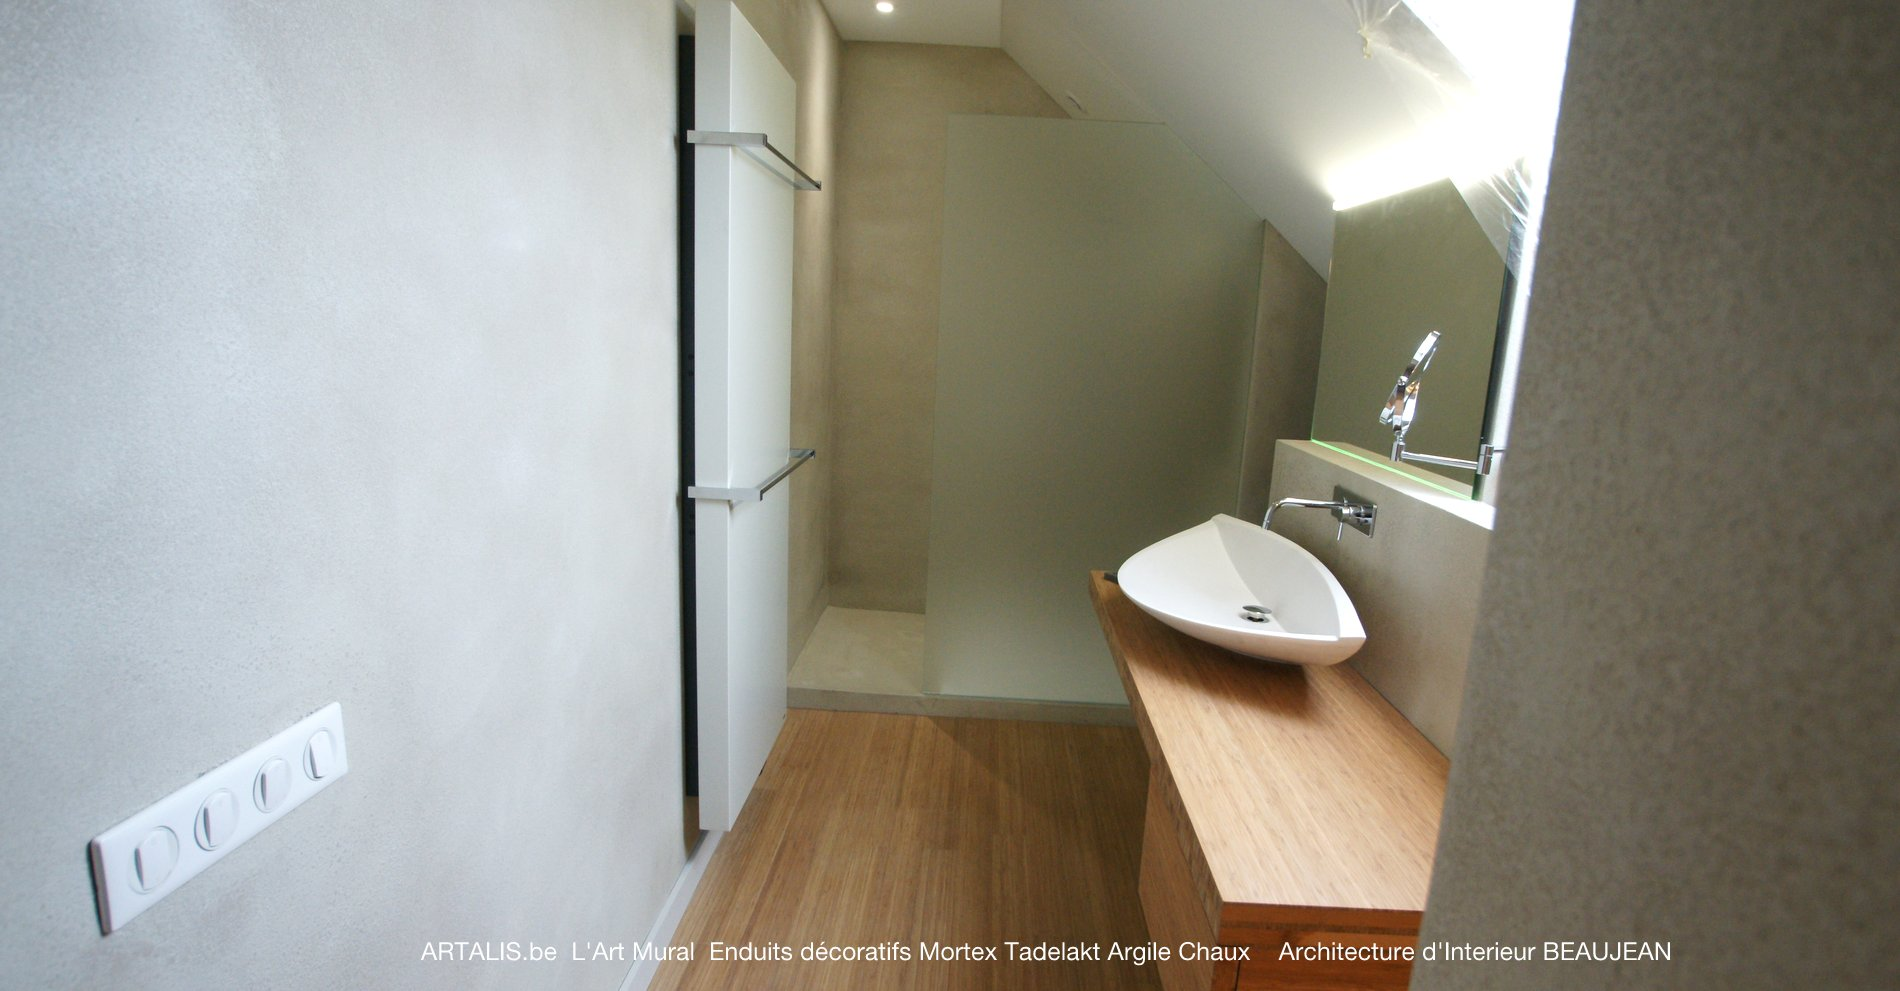 Italiaanse mortex badkamer en douche - Italiaanse badkamer ...